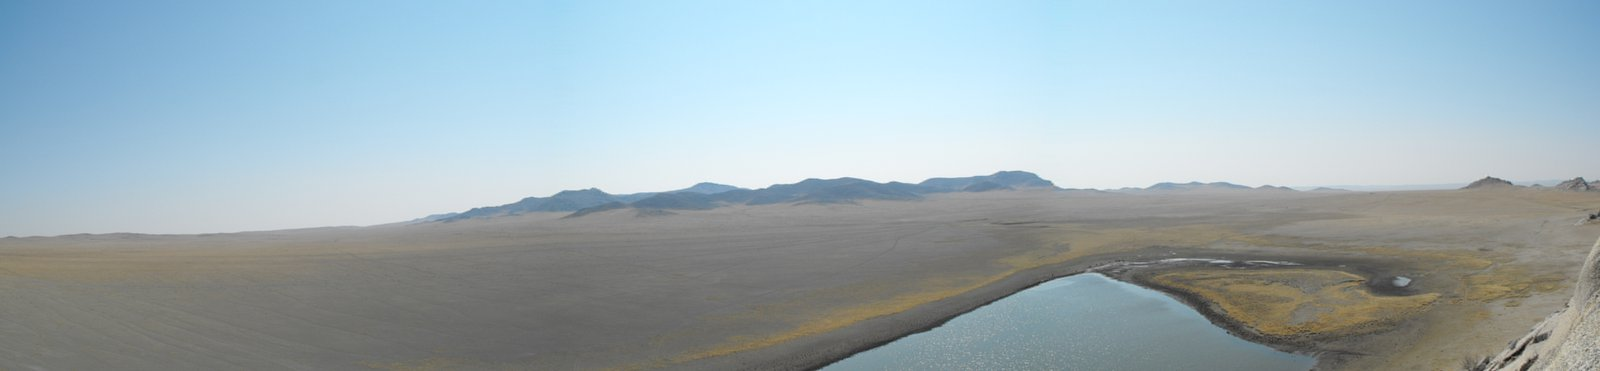 Mongolia Countryside